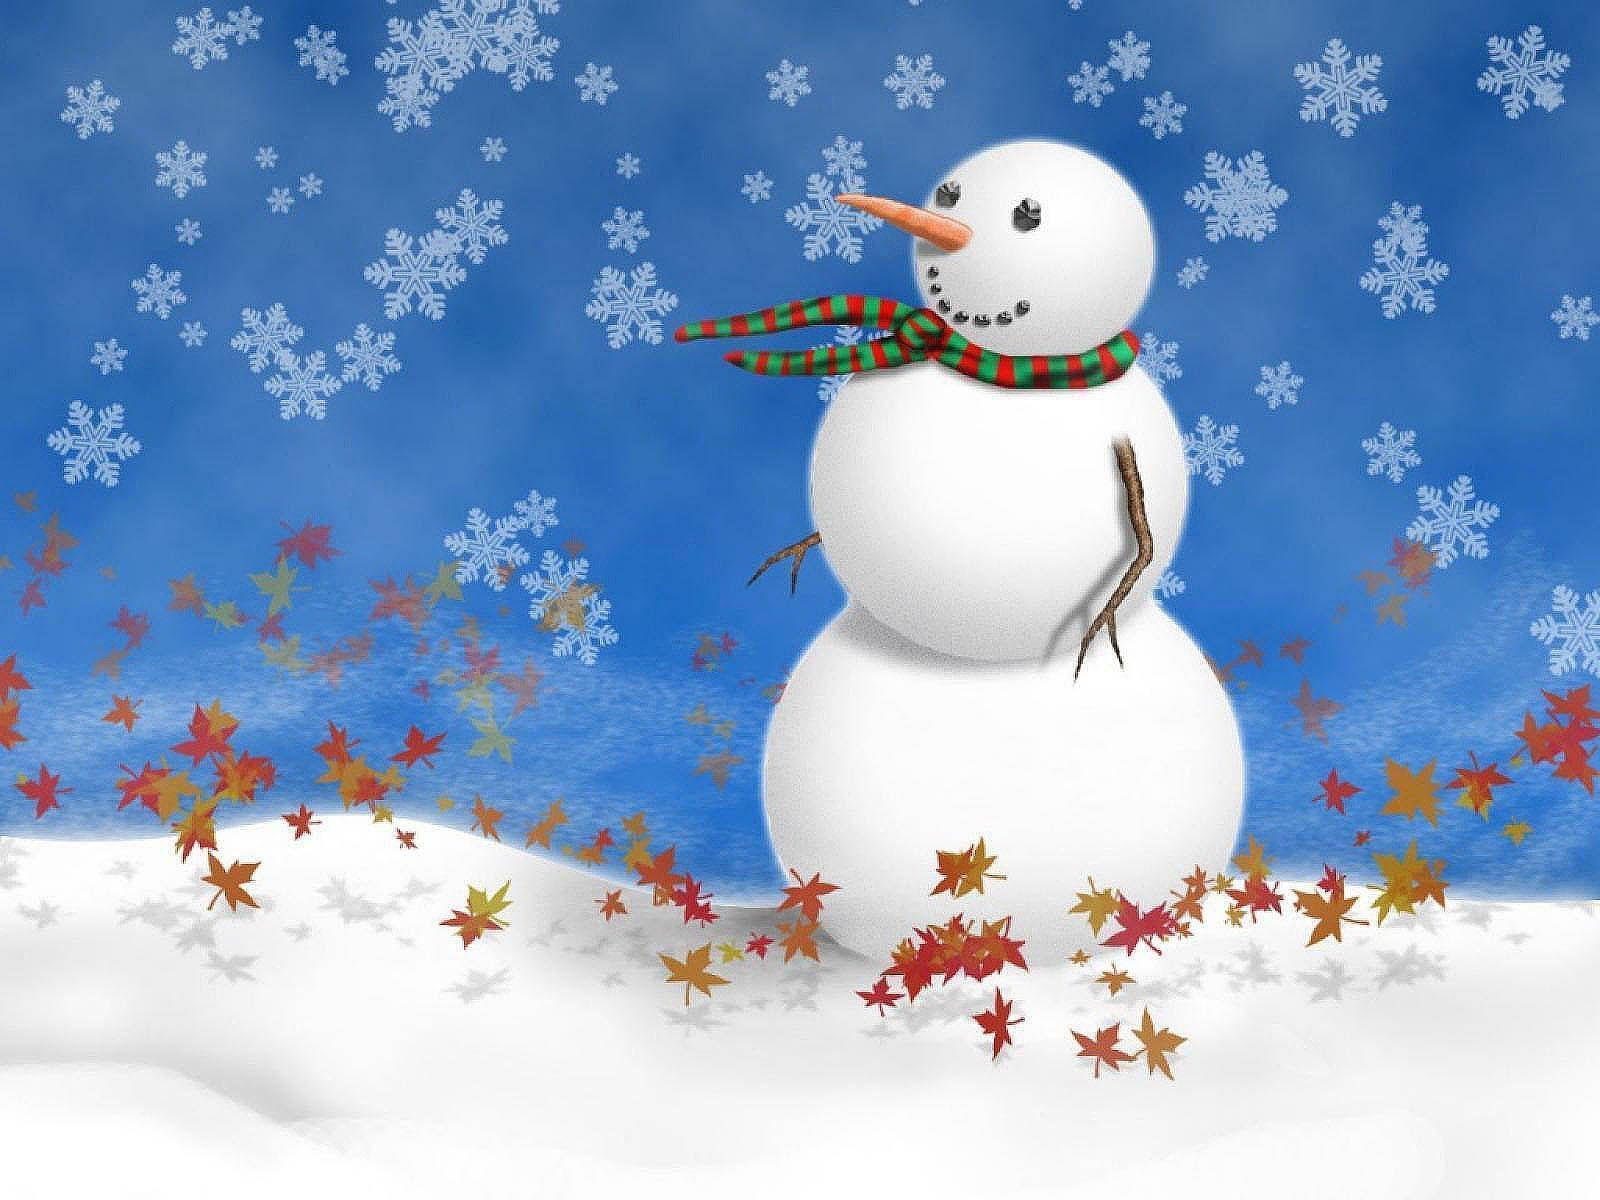 Frosty Fall Leaves Wallpaper Snowman Desktop Backgrounds Wallpaper Cave